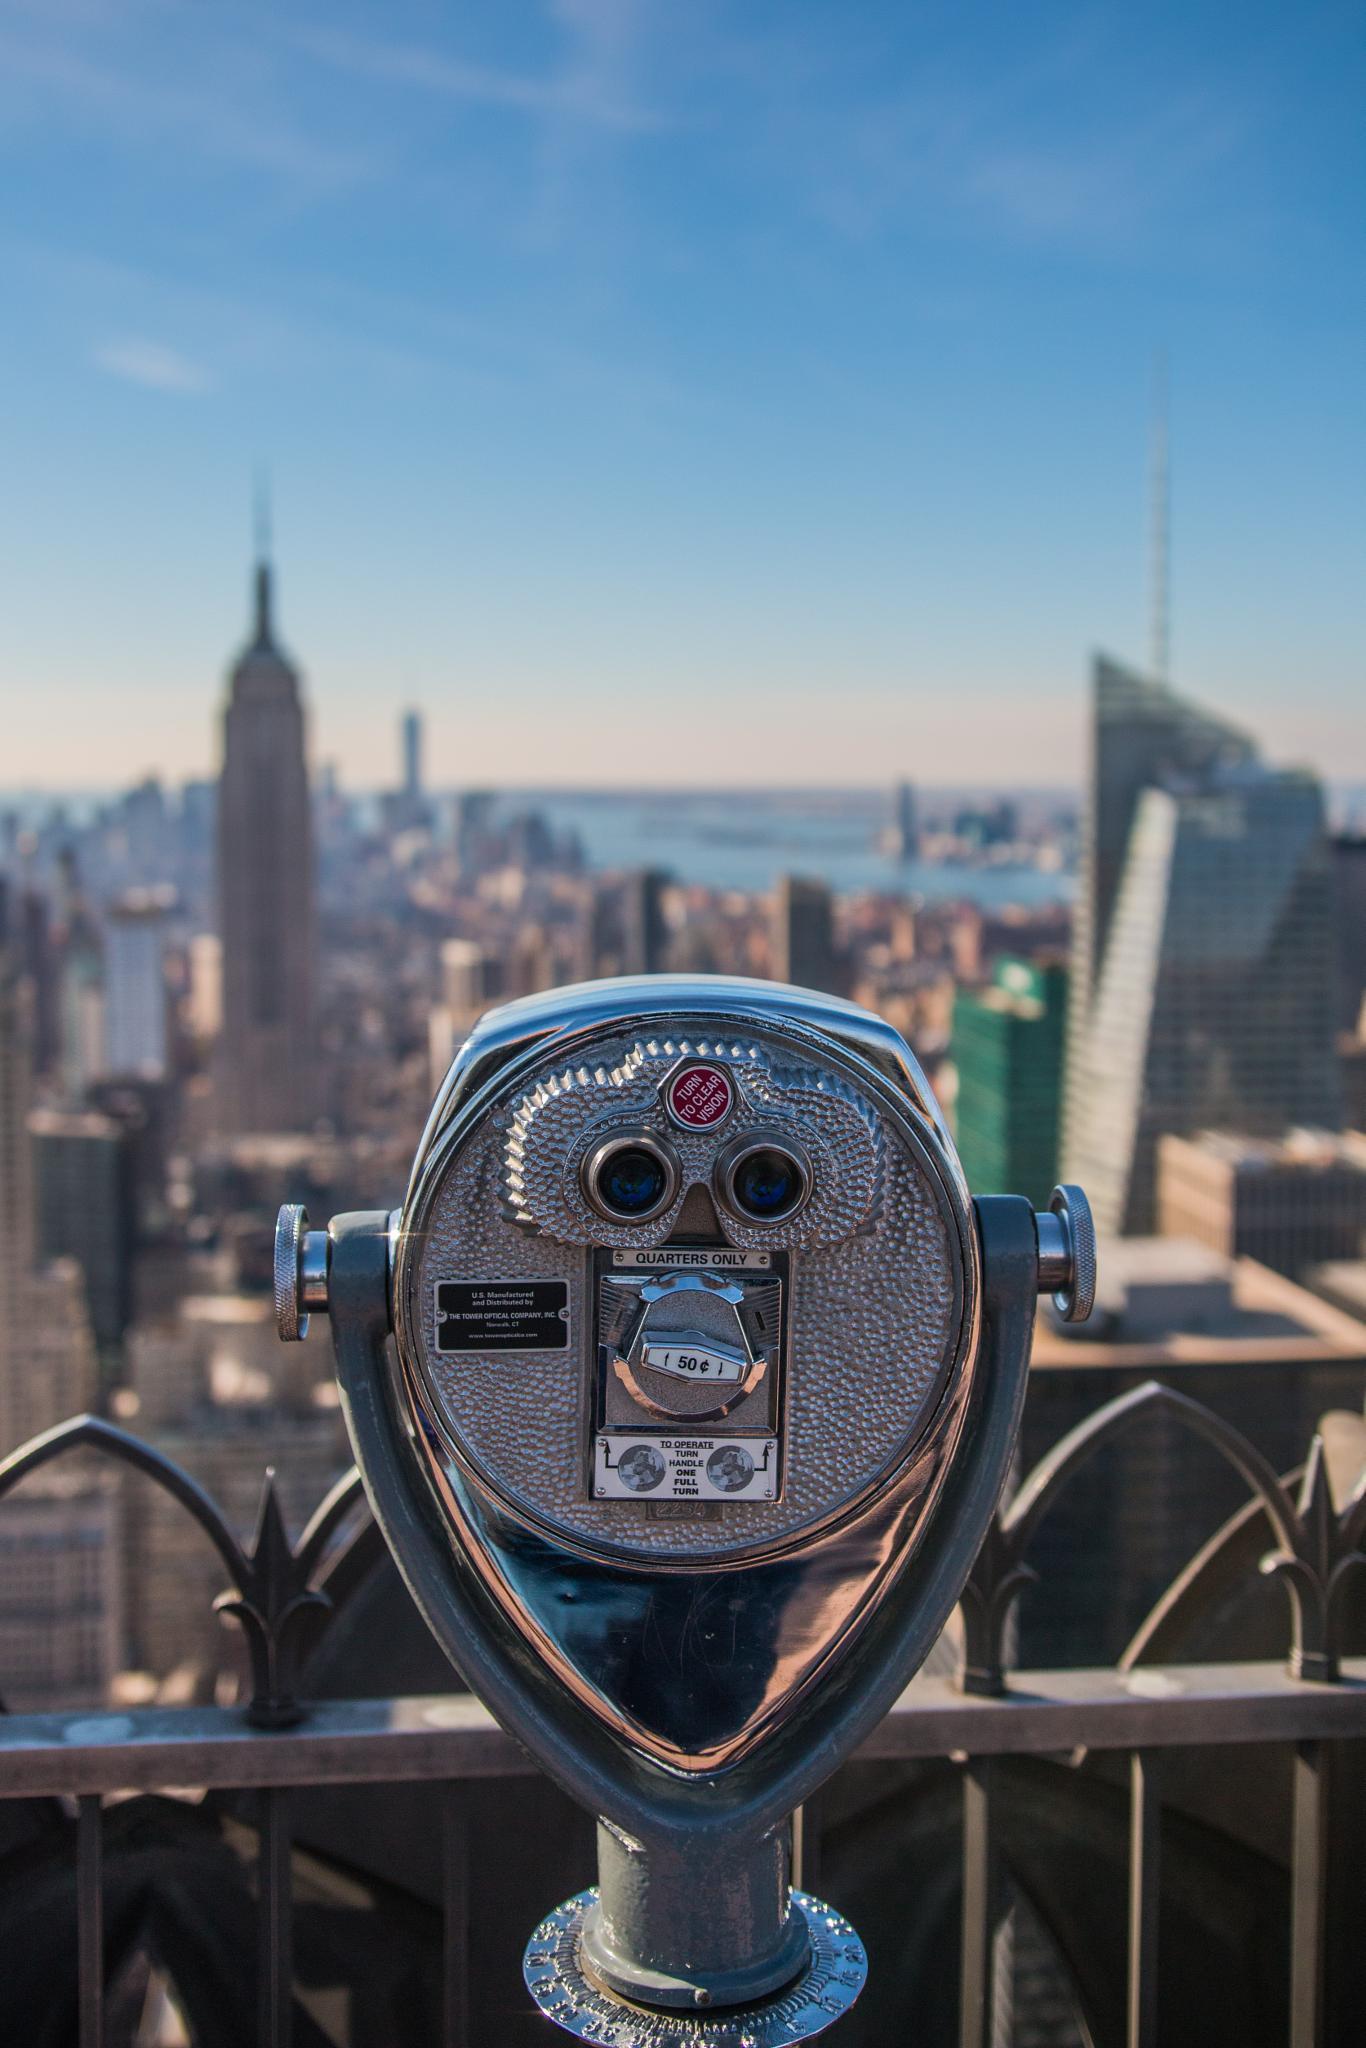 Take In The View by Gareth Sawbridge